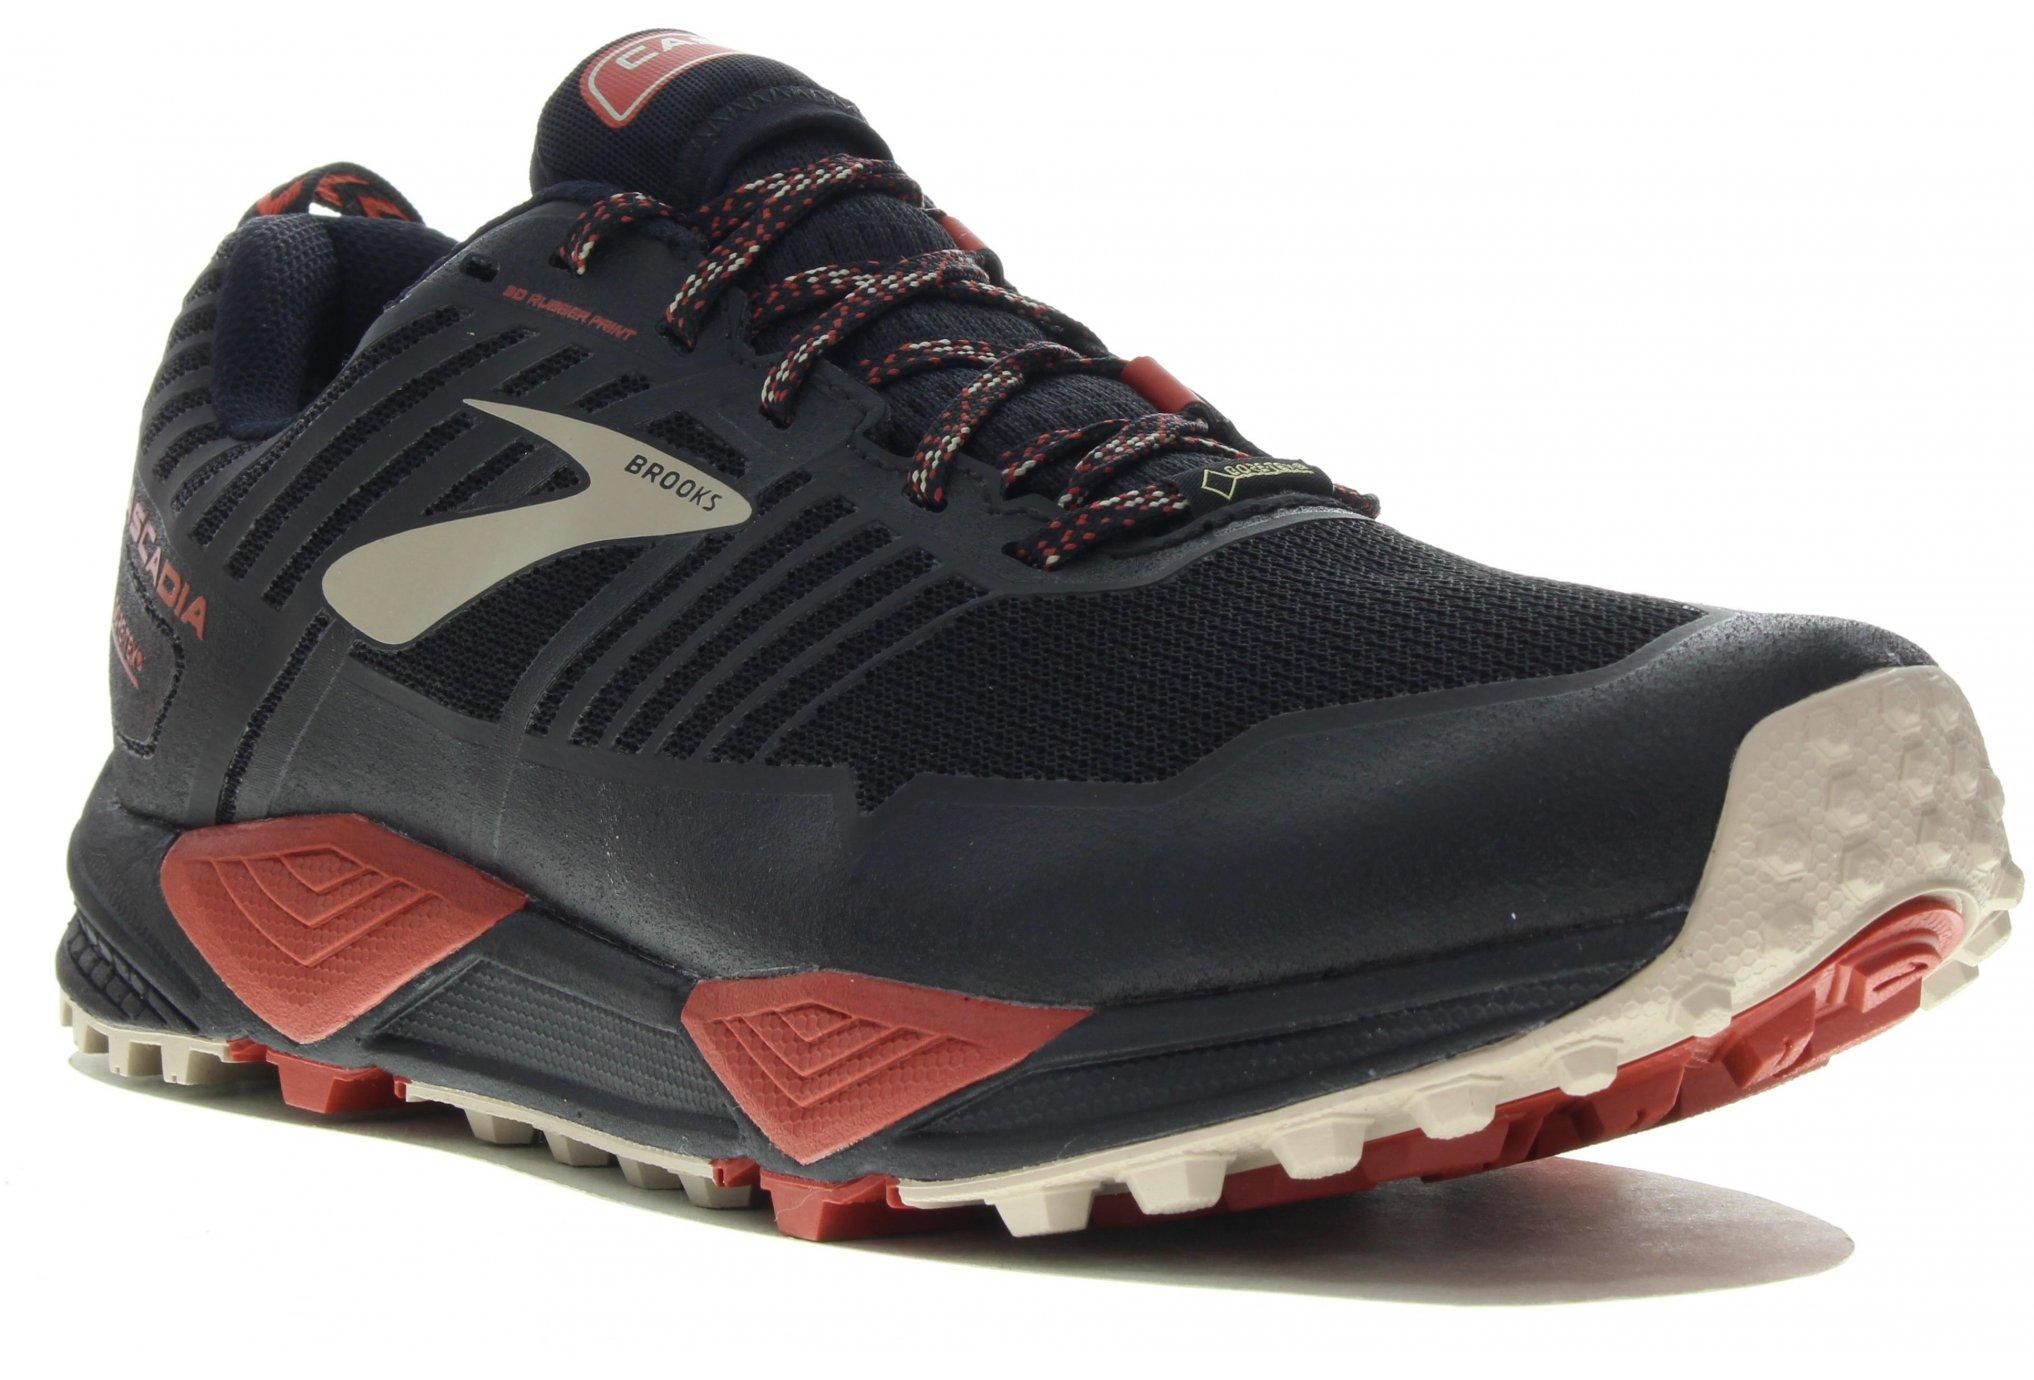 chaussures de sport 8f996 991c6 Chaussures de Trail: SALOMON SPEEDCROSS 3 (NOIR/TOMATE/VERT ...